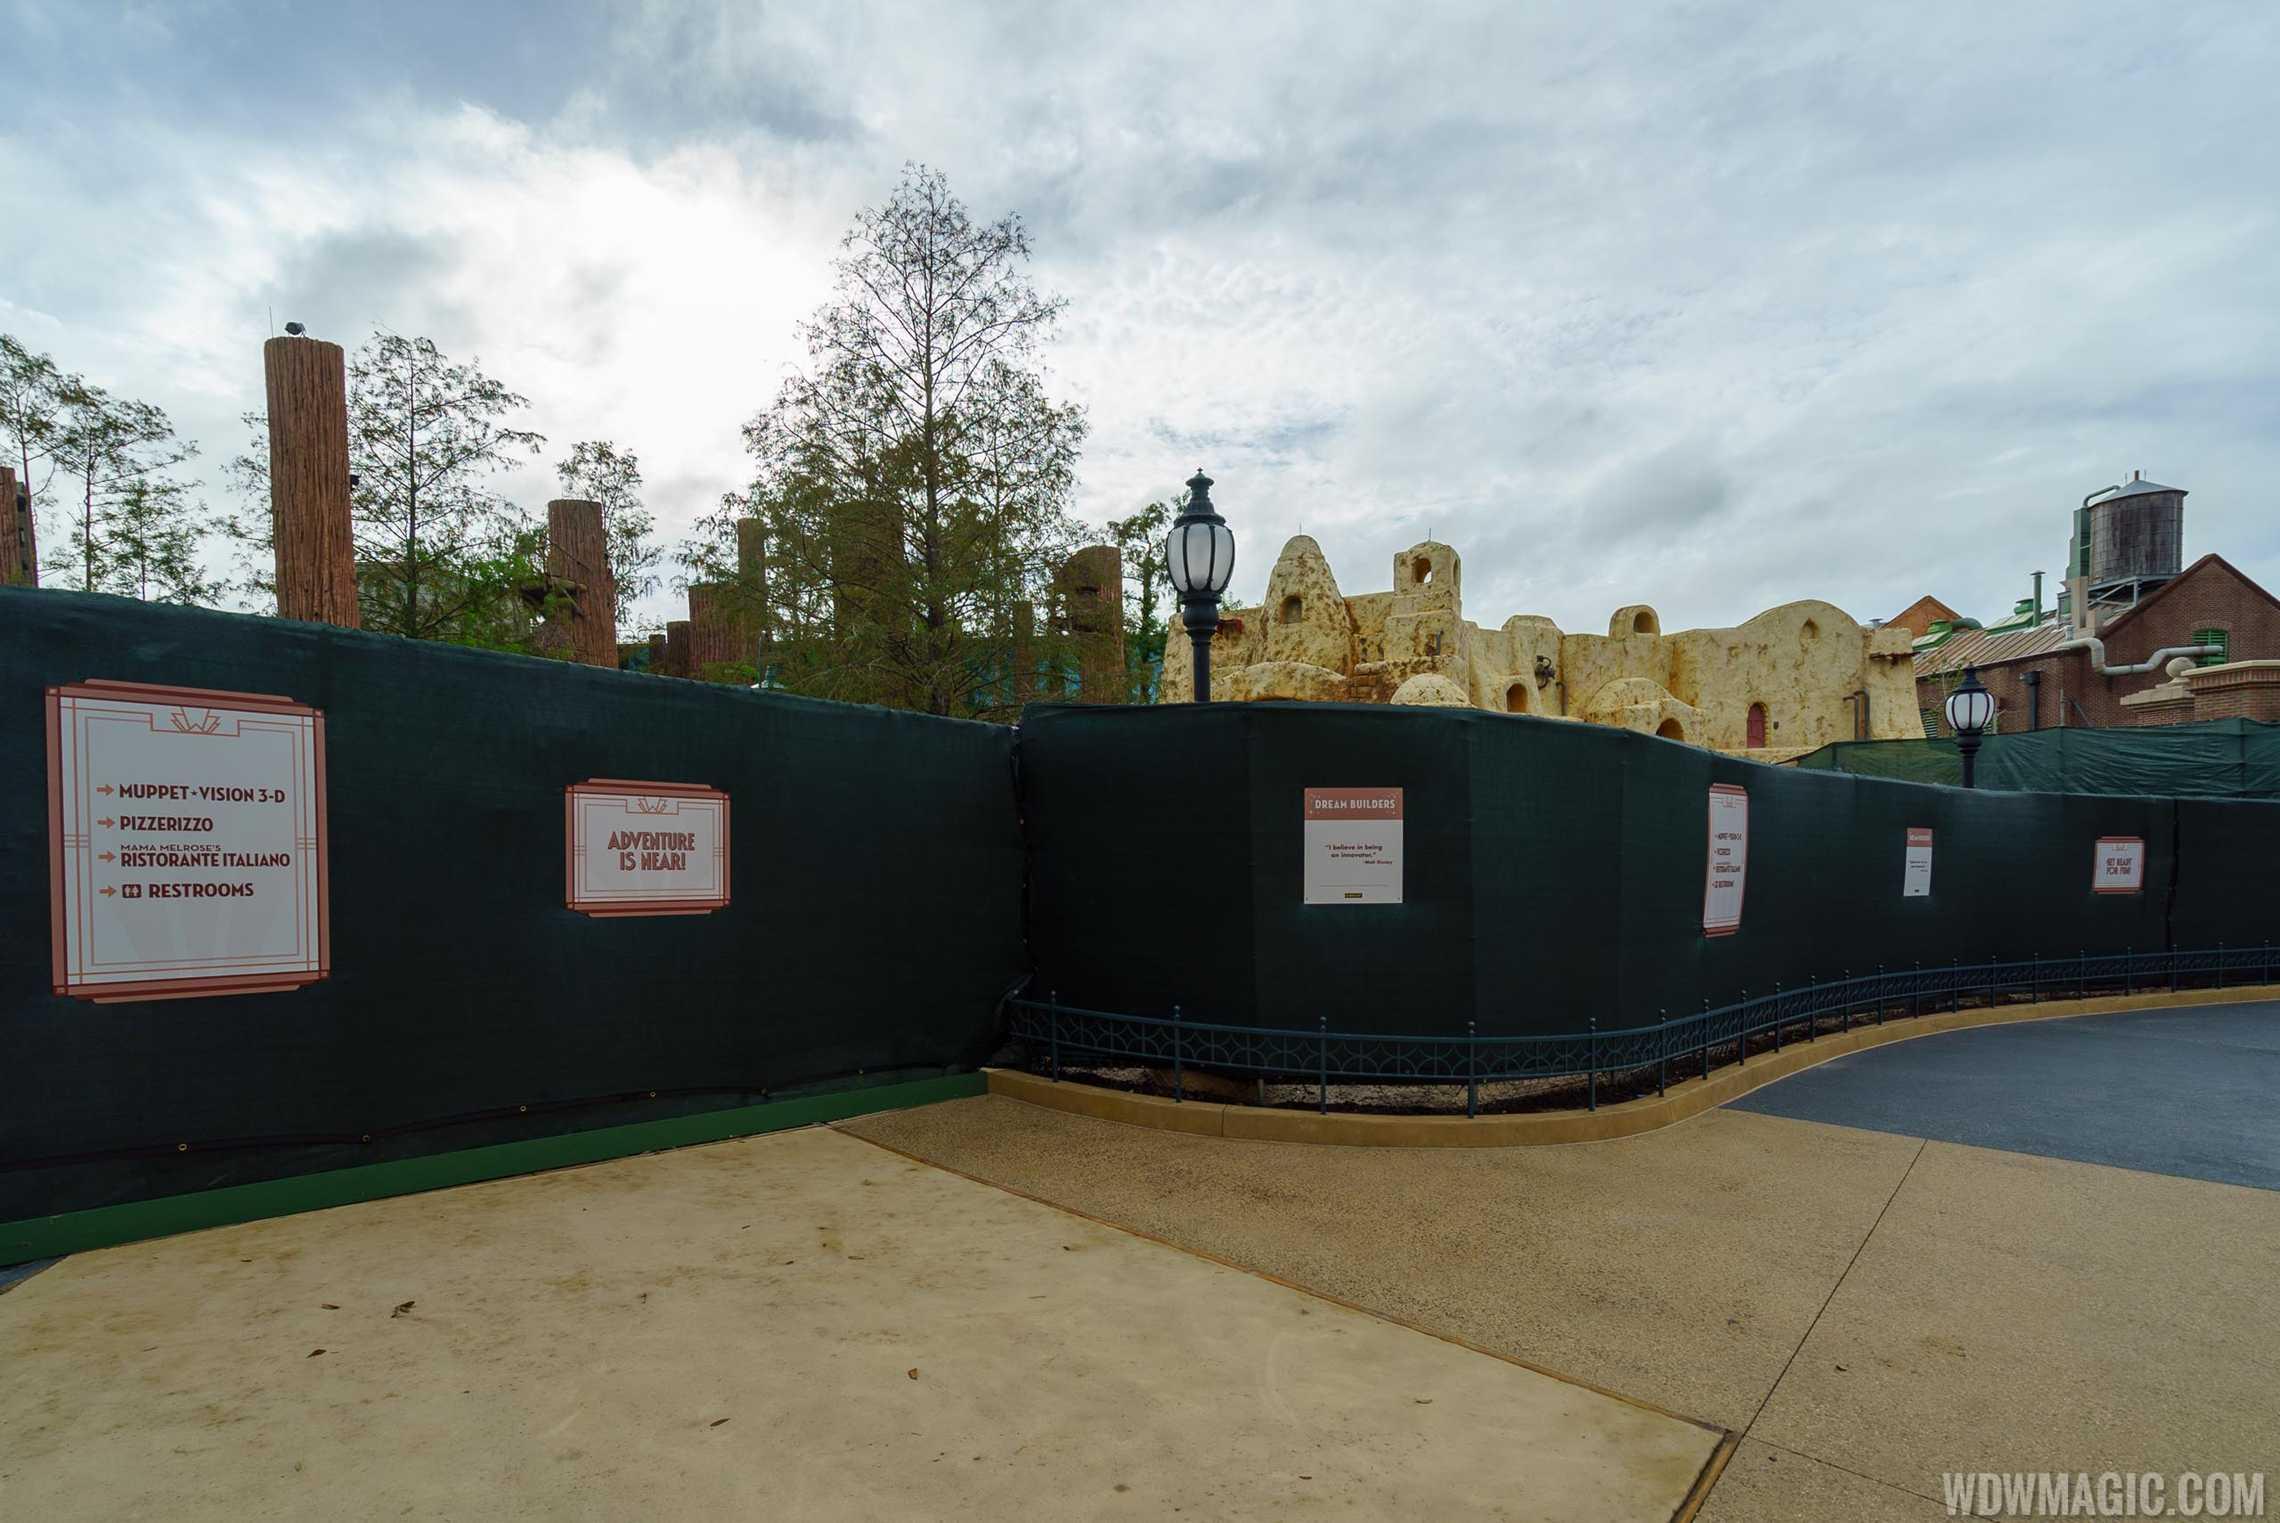 Construction around Entrance to Star Wars Galaxy's Edge